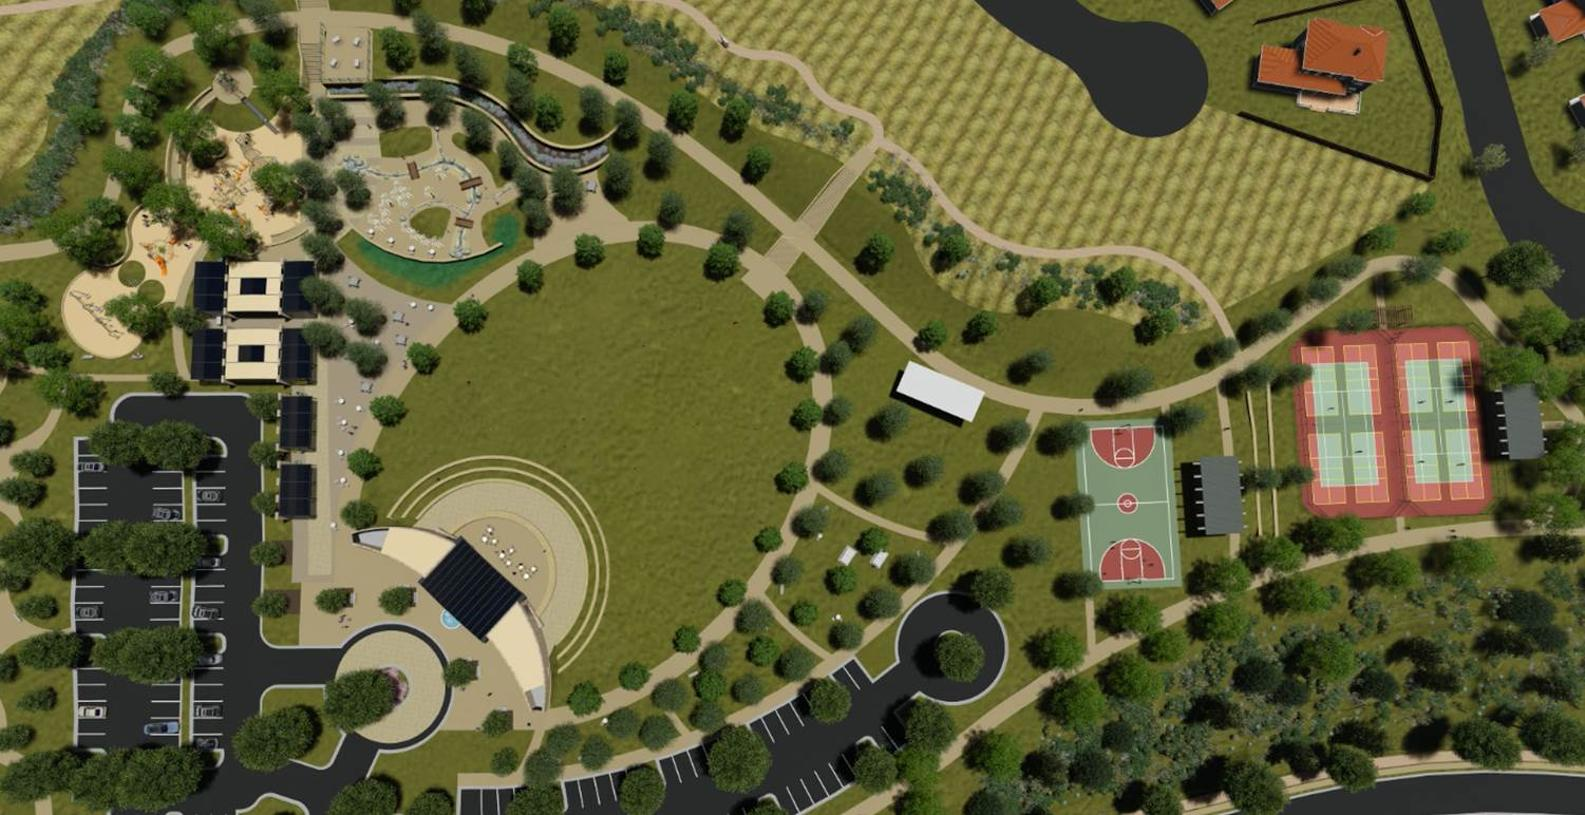 Future Porter Ranch Park Overall Site